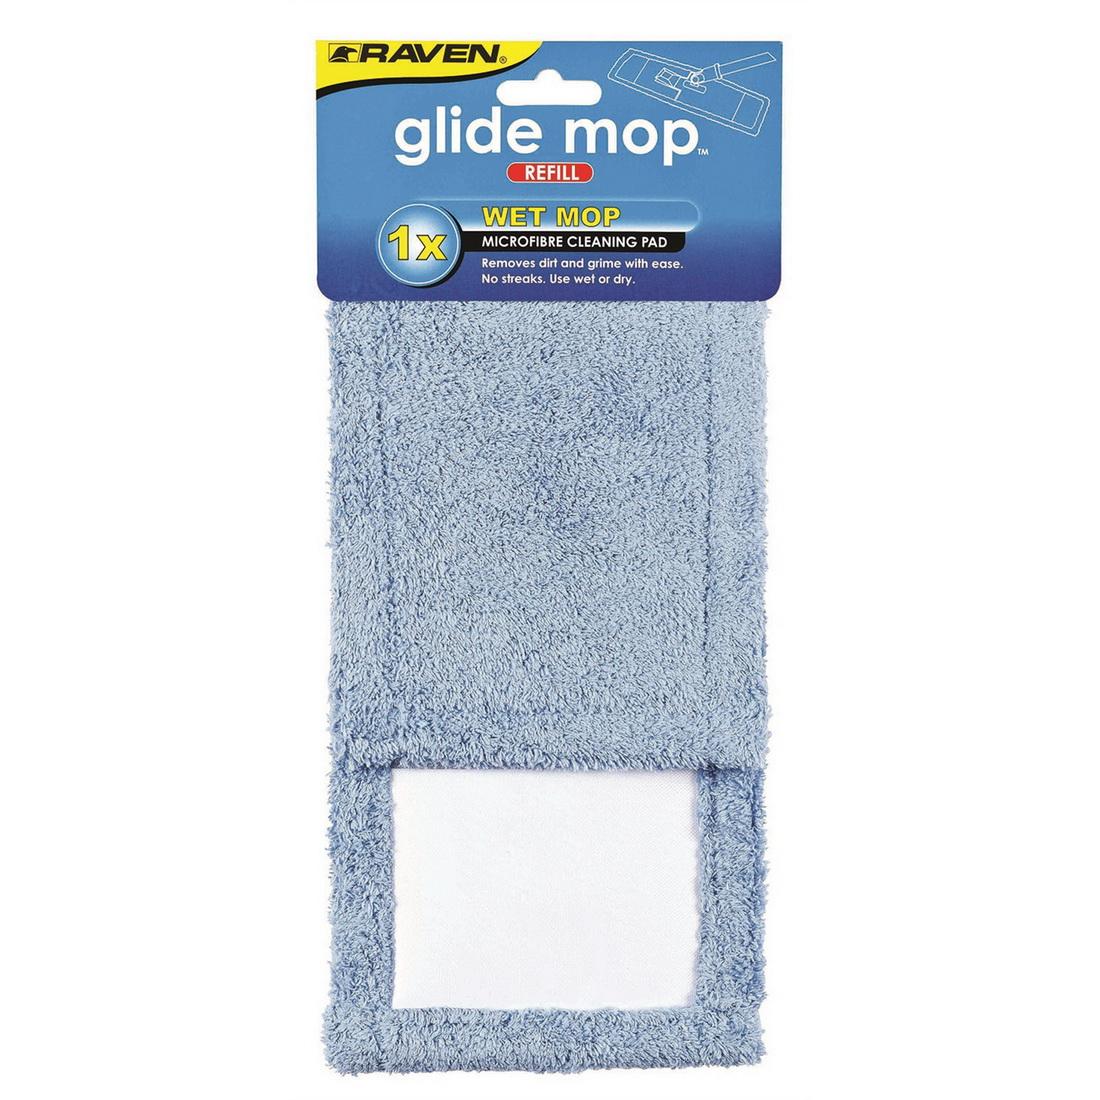 Glide Mop Refill - Wet Microfibre 2511